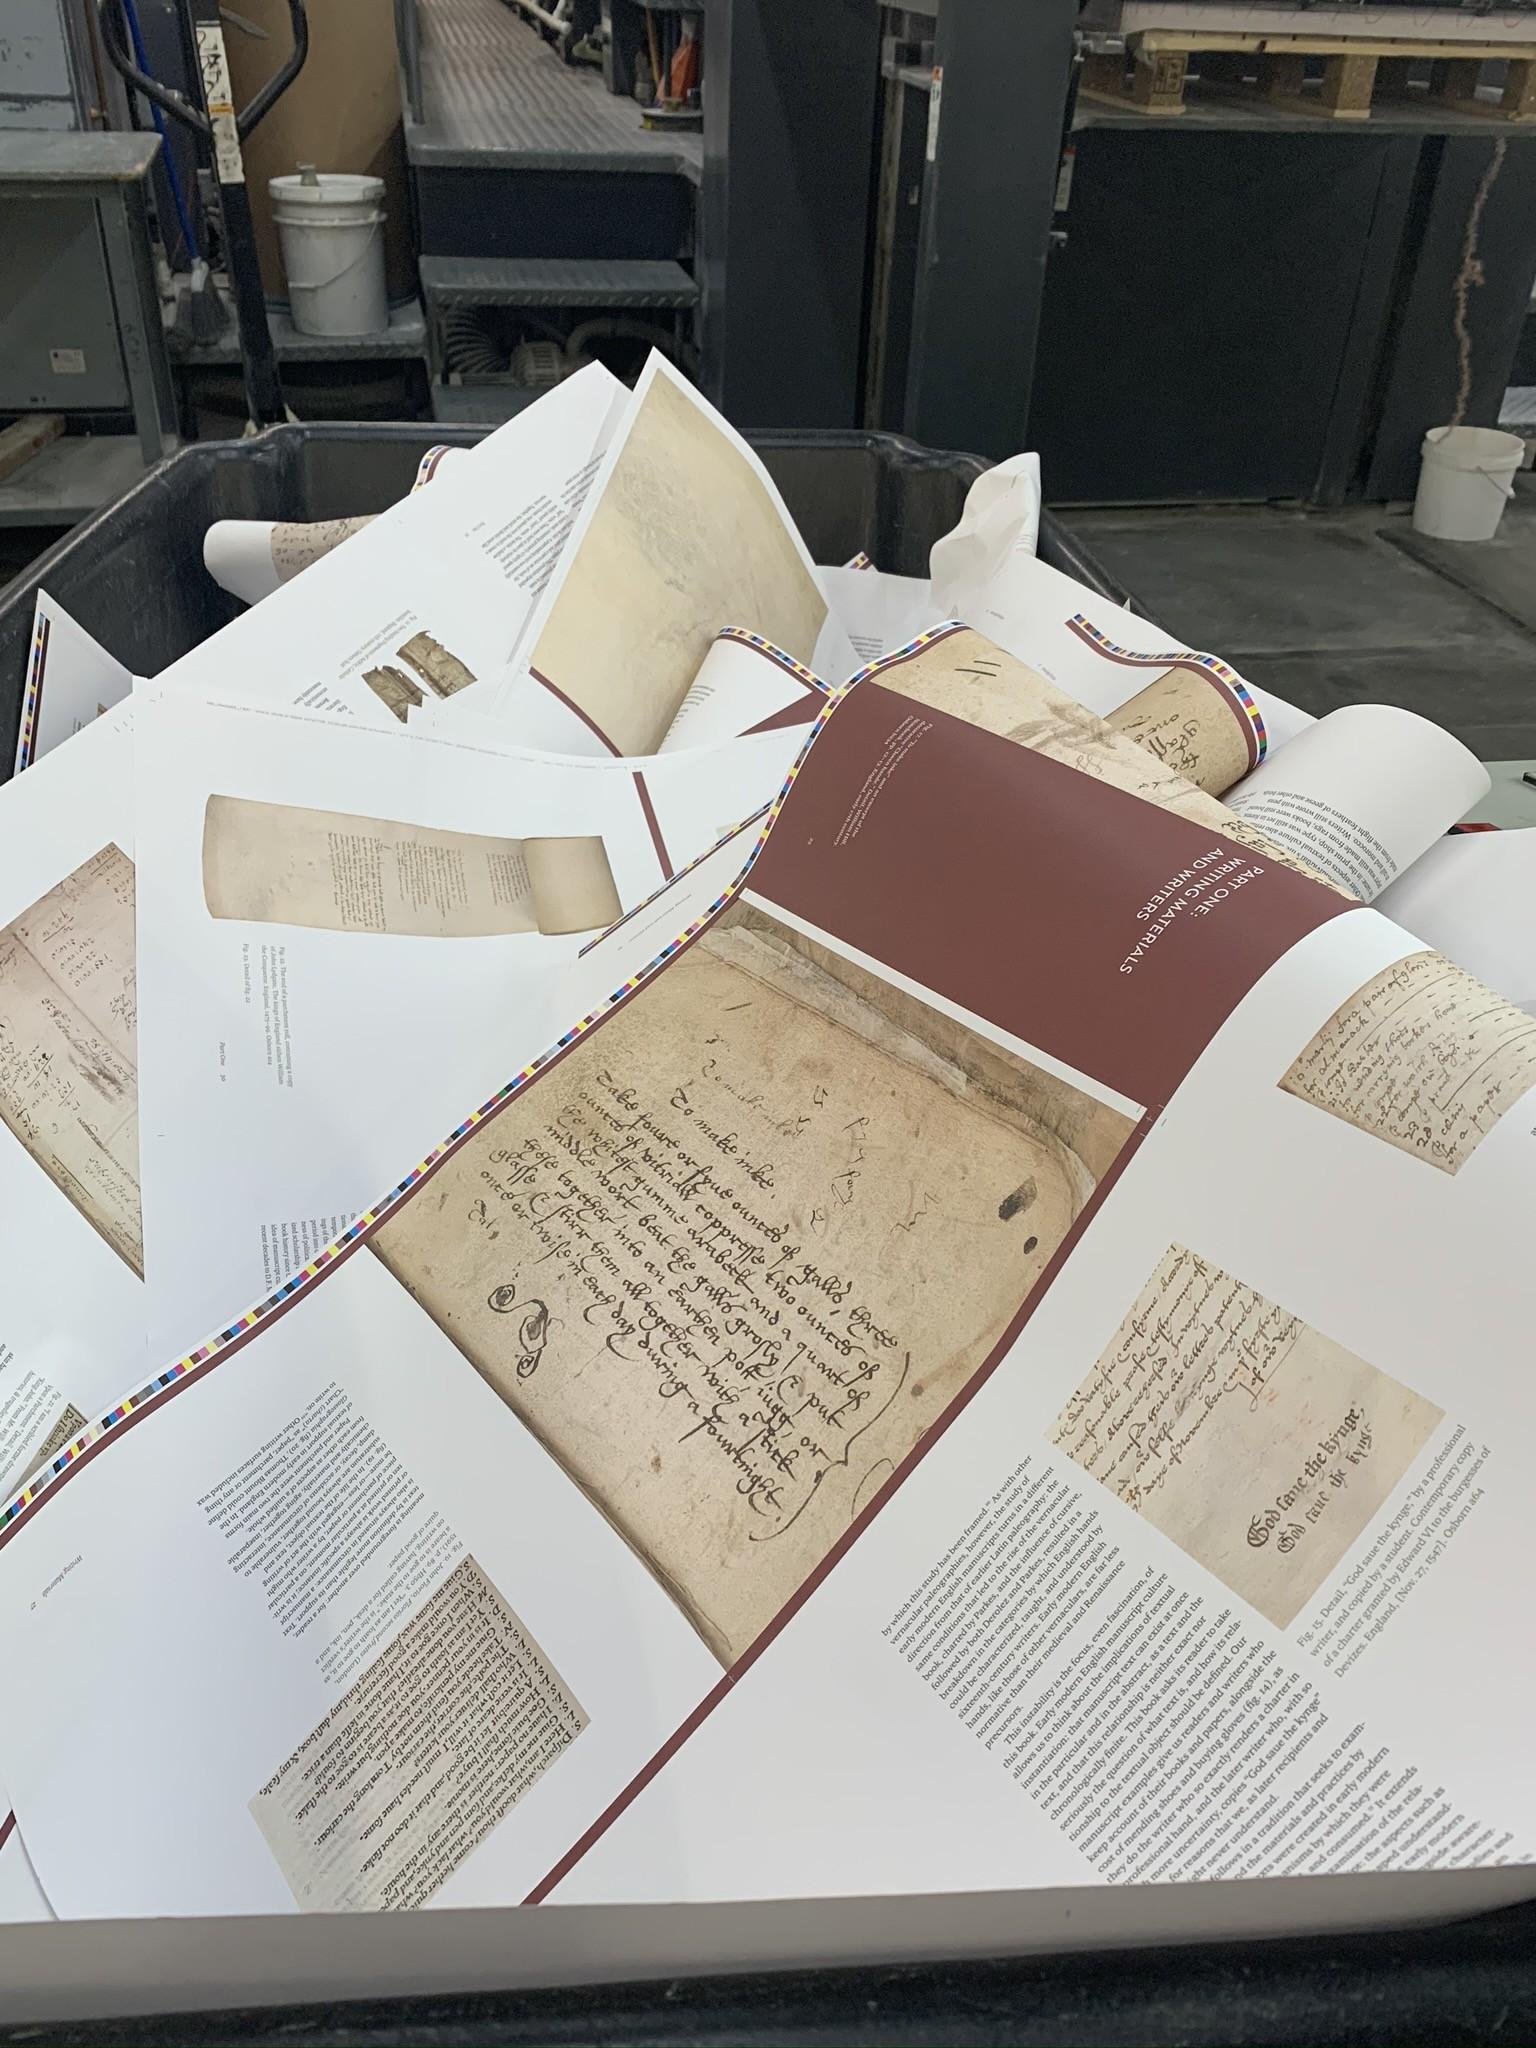 Beinecke Library exhibition invites bibliomaniacs to go